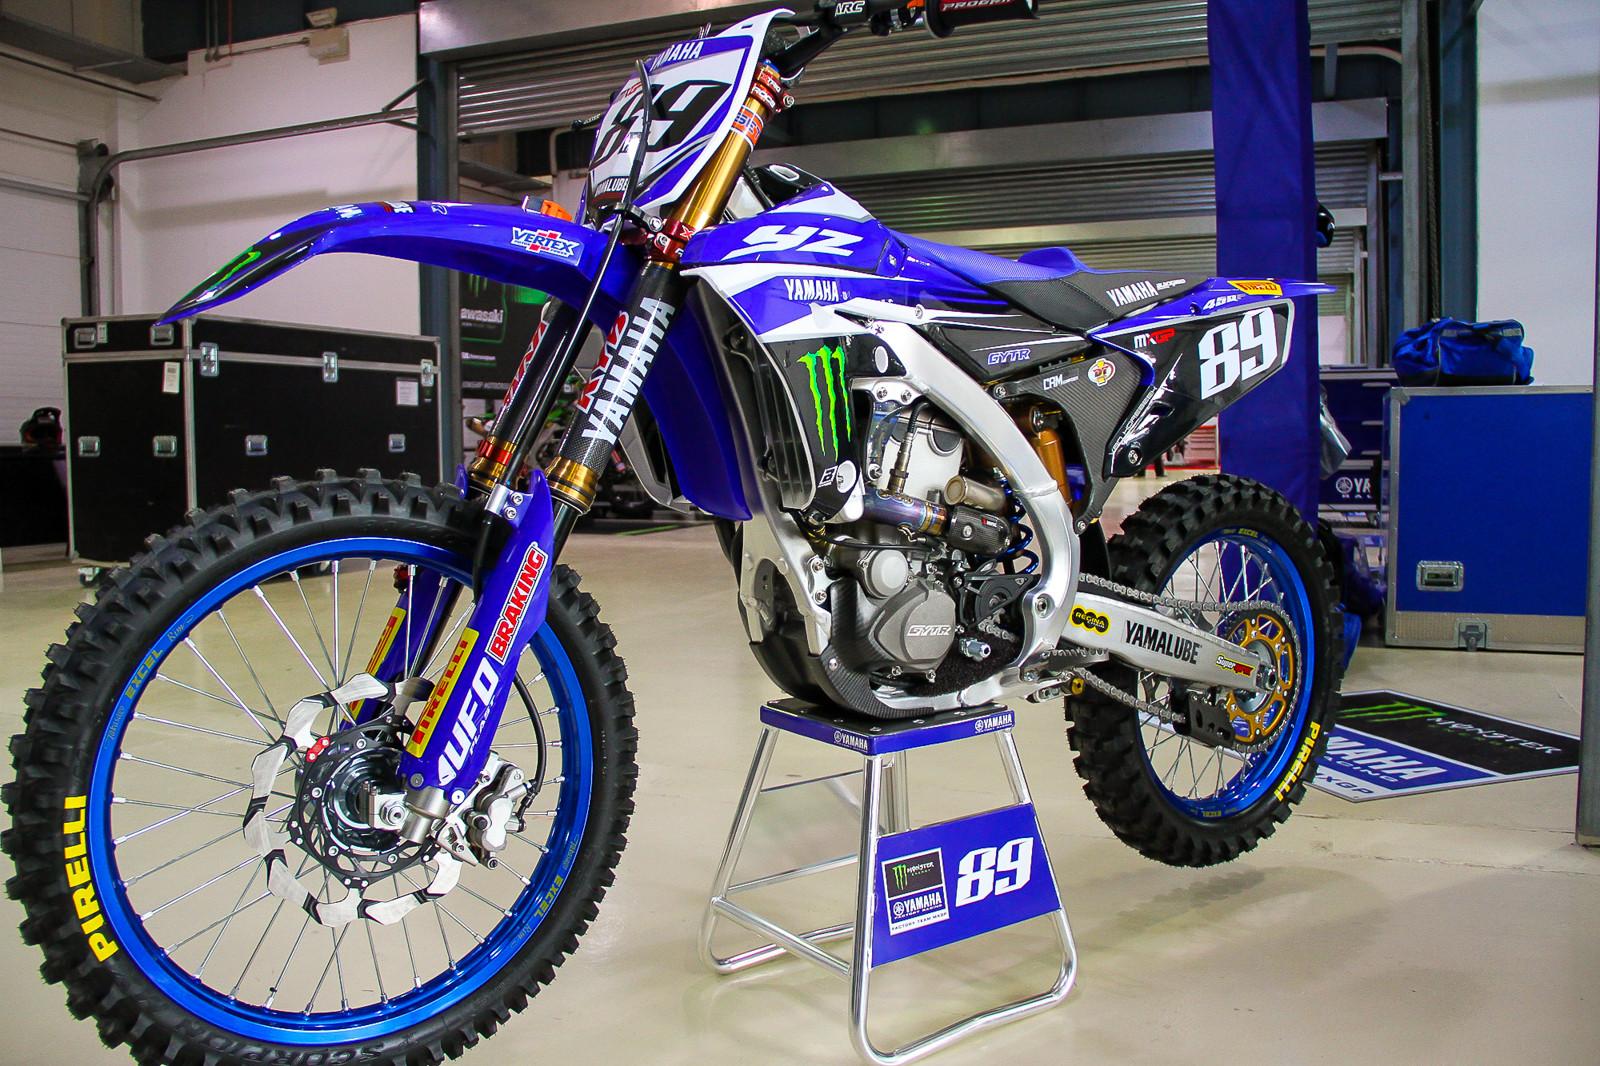 Jeremy Van Horebeek's Monster Energy Yamaha Rinaldi YZ450F - Vital MX Pit Bits: 2017 MXGP of Qatar - Motocross Pictures - Vital MX